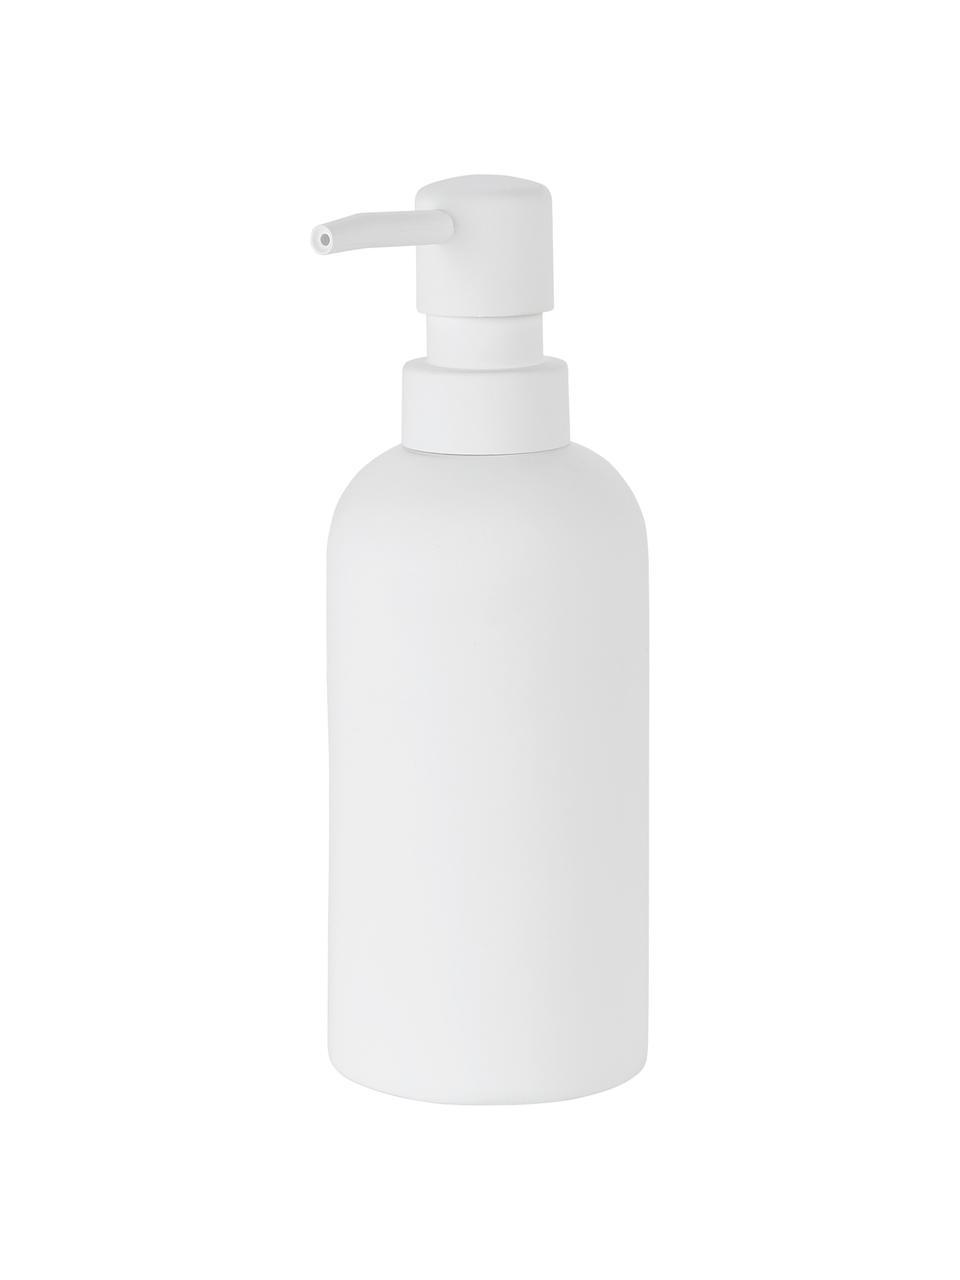 Dispenser sapone Archway, Materiale sintetico, Bianco, Ø 7 x Alt. 19 cm